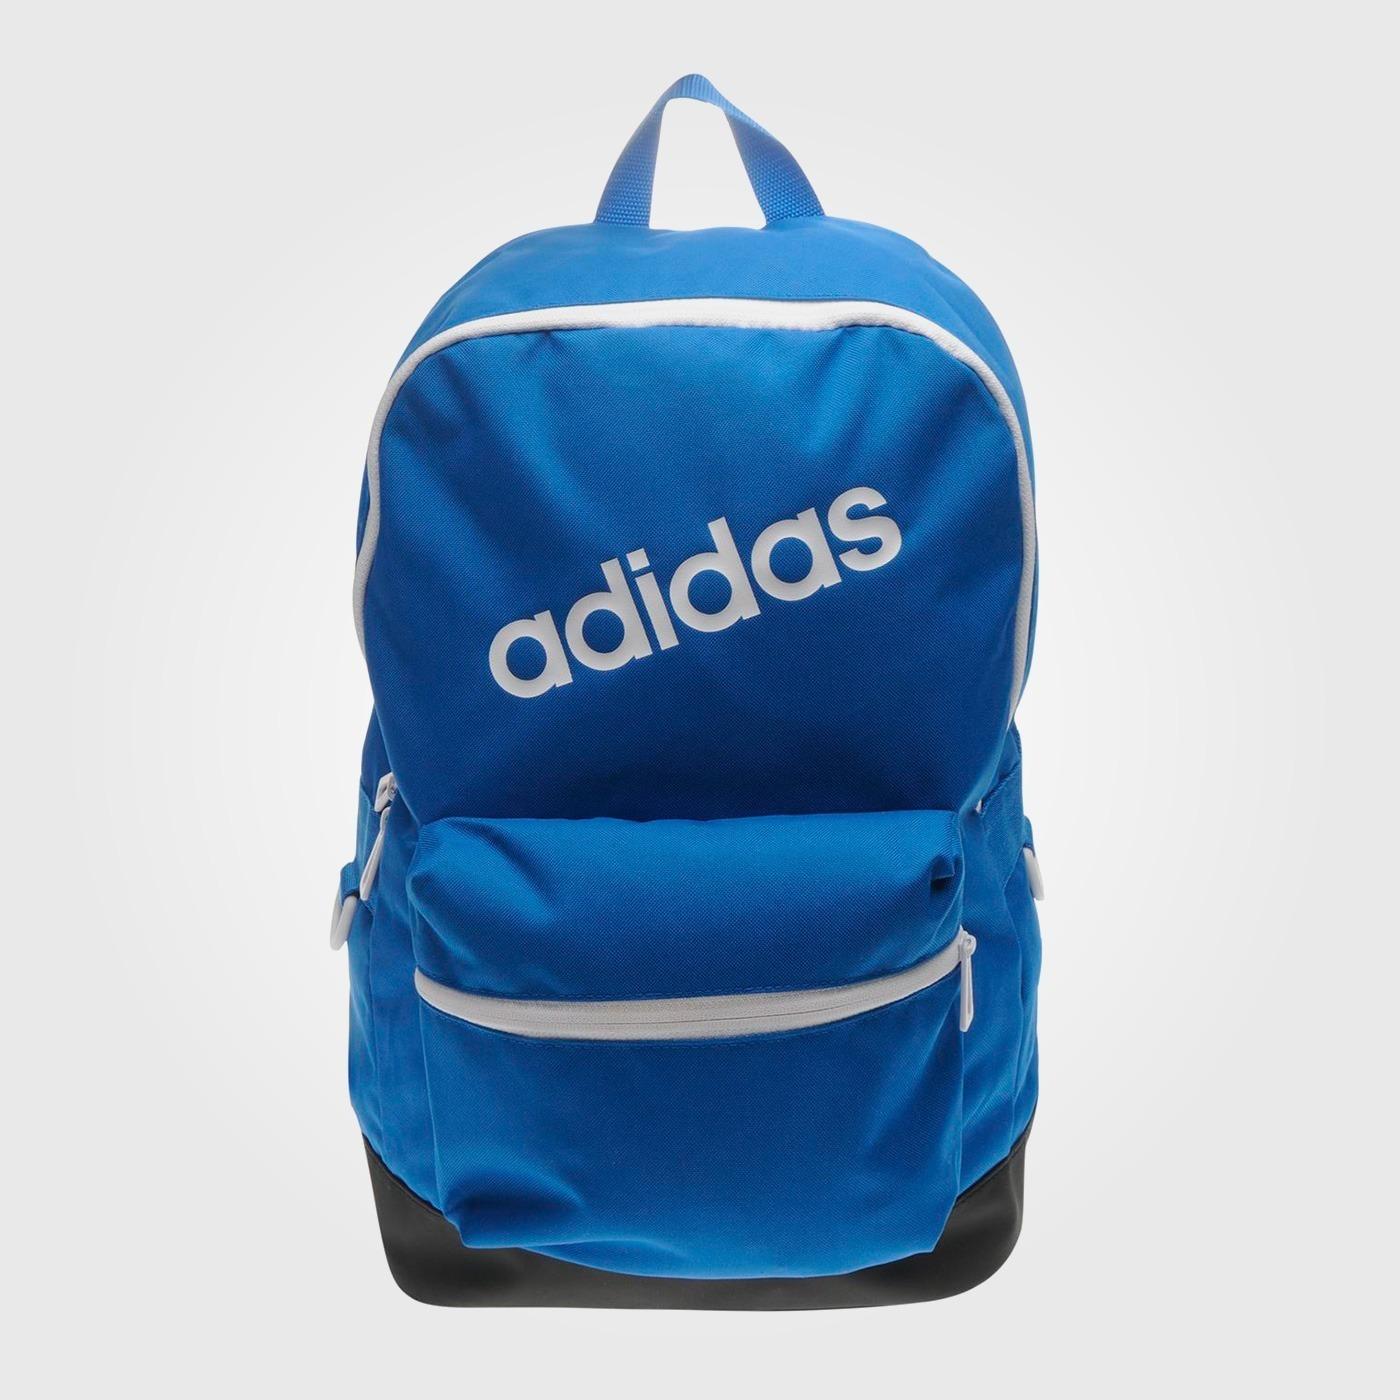 Рюкзак Adidas Daily Blue/White